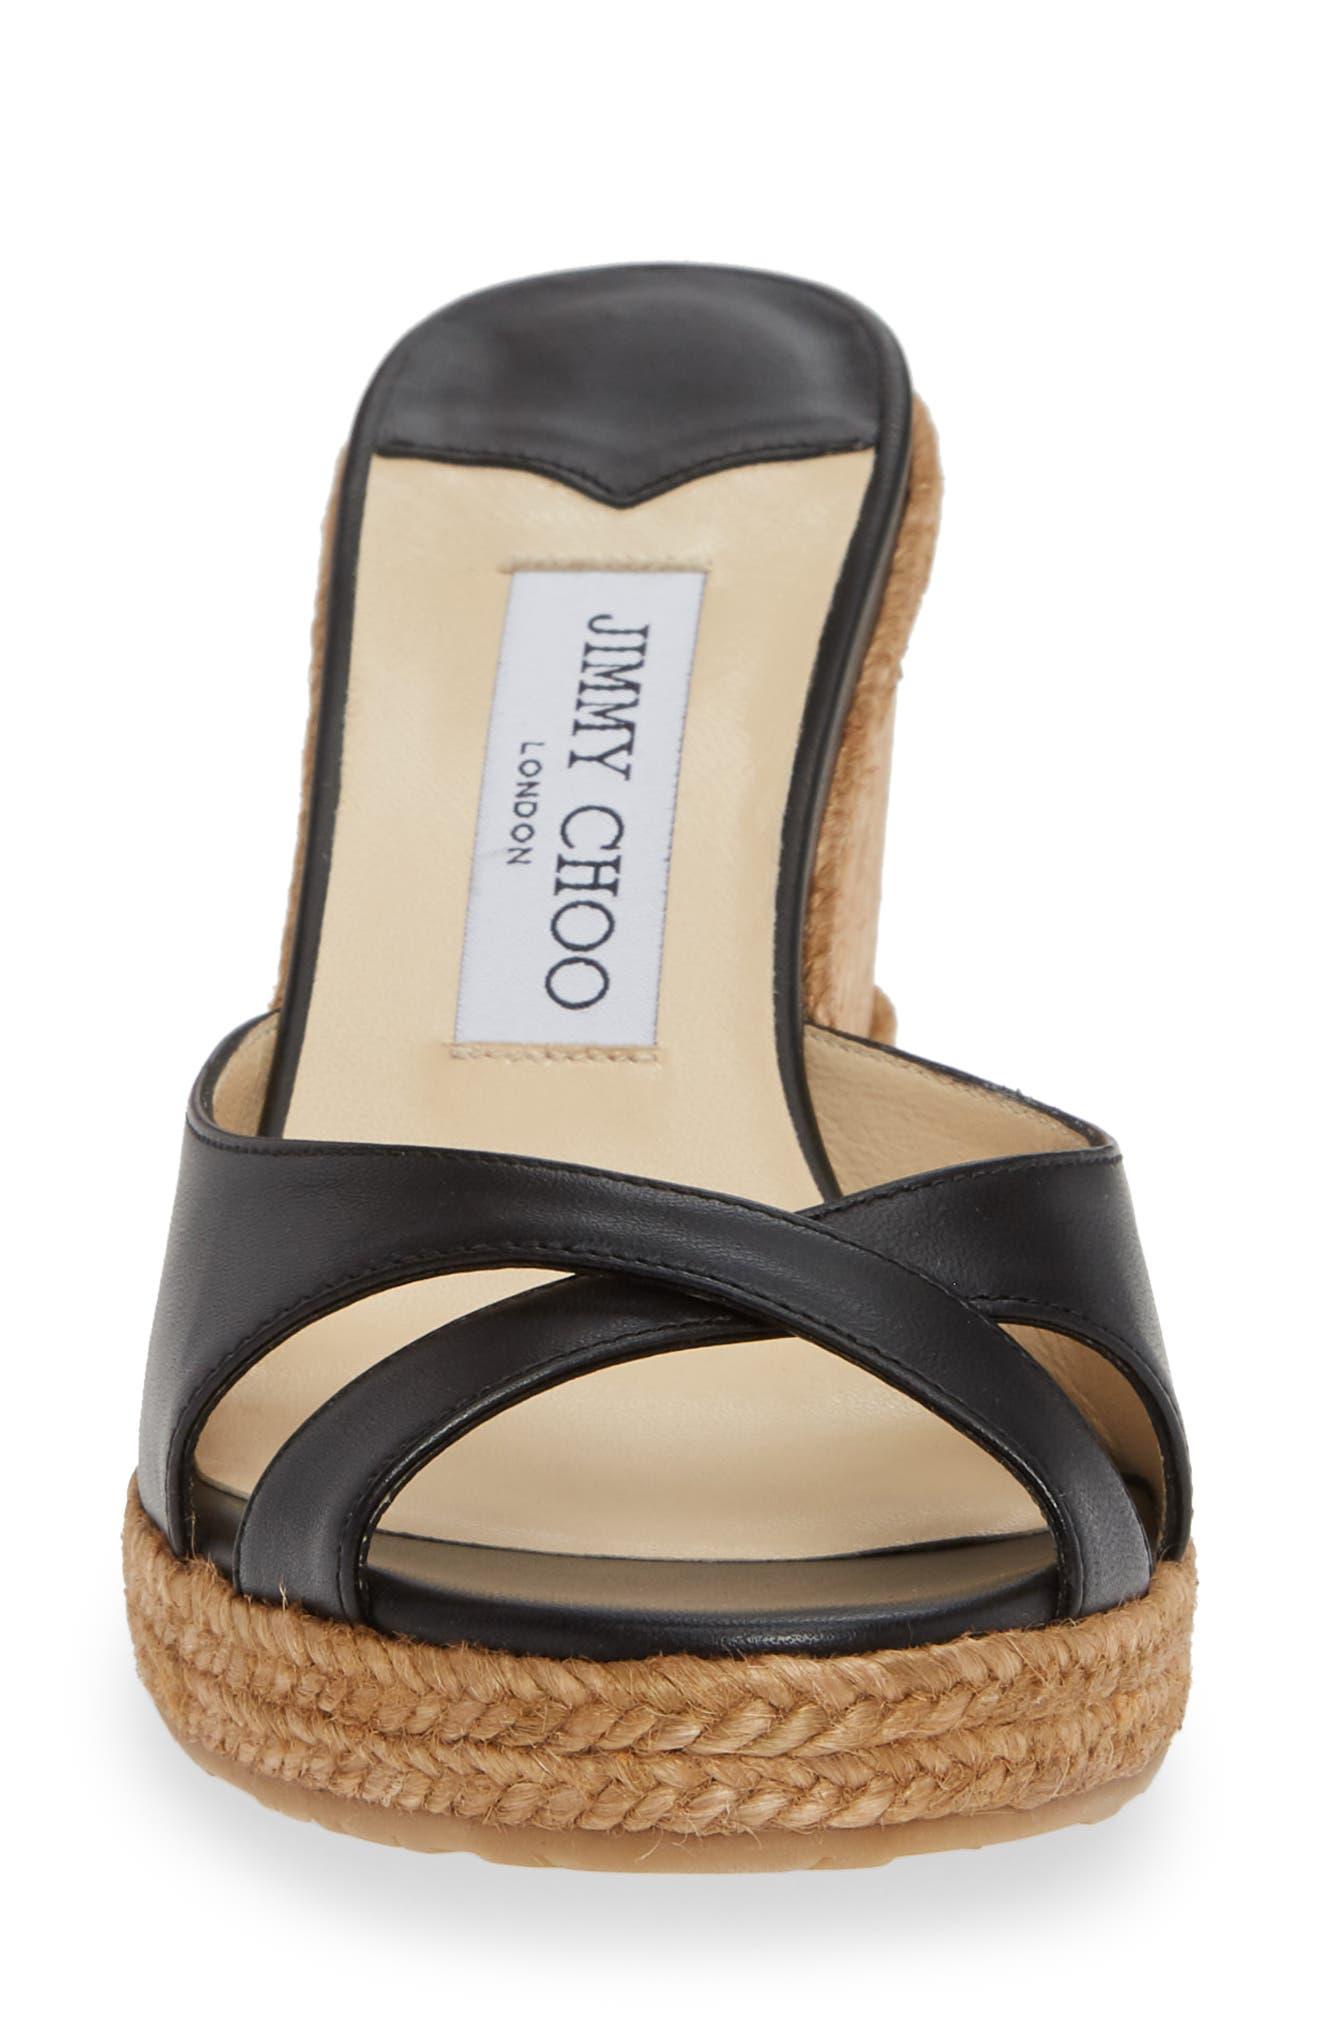 JIMMY CHOO, Almer Cork Wedge Sandal, Alternate thumbnail 4, color, BLACK